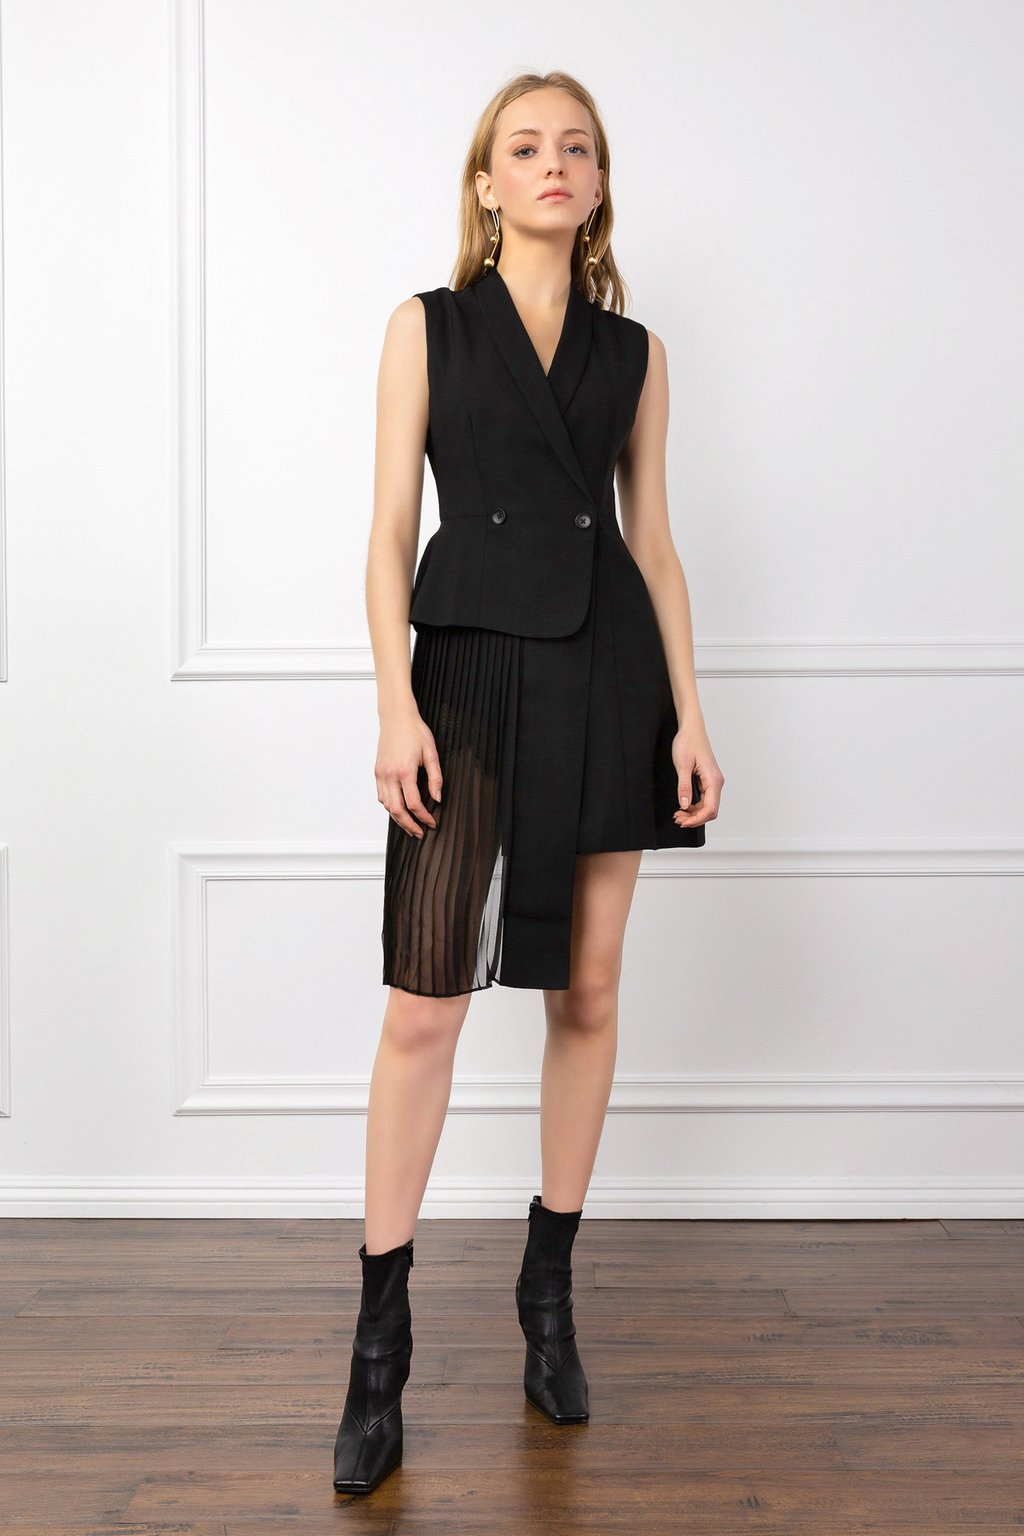 Office Odette Black Dress by J.ING women's fashion clothing